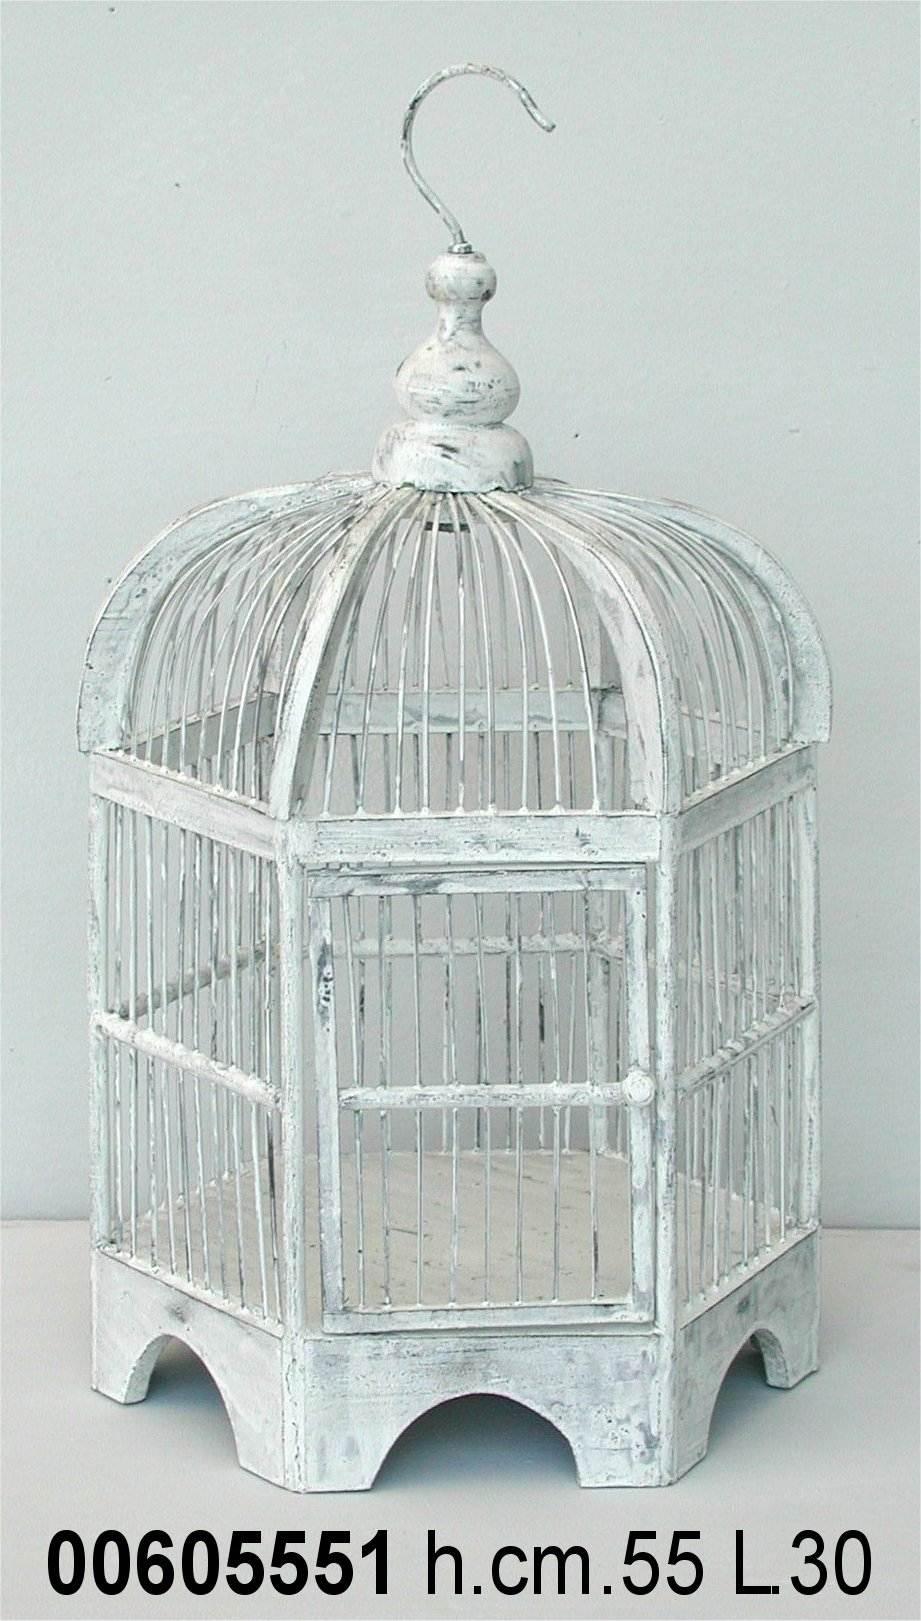 Antica Soffitta Gabbia per uccelli decorativa esagonale